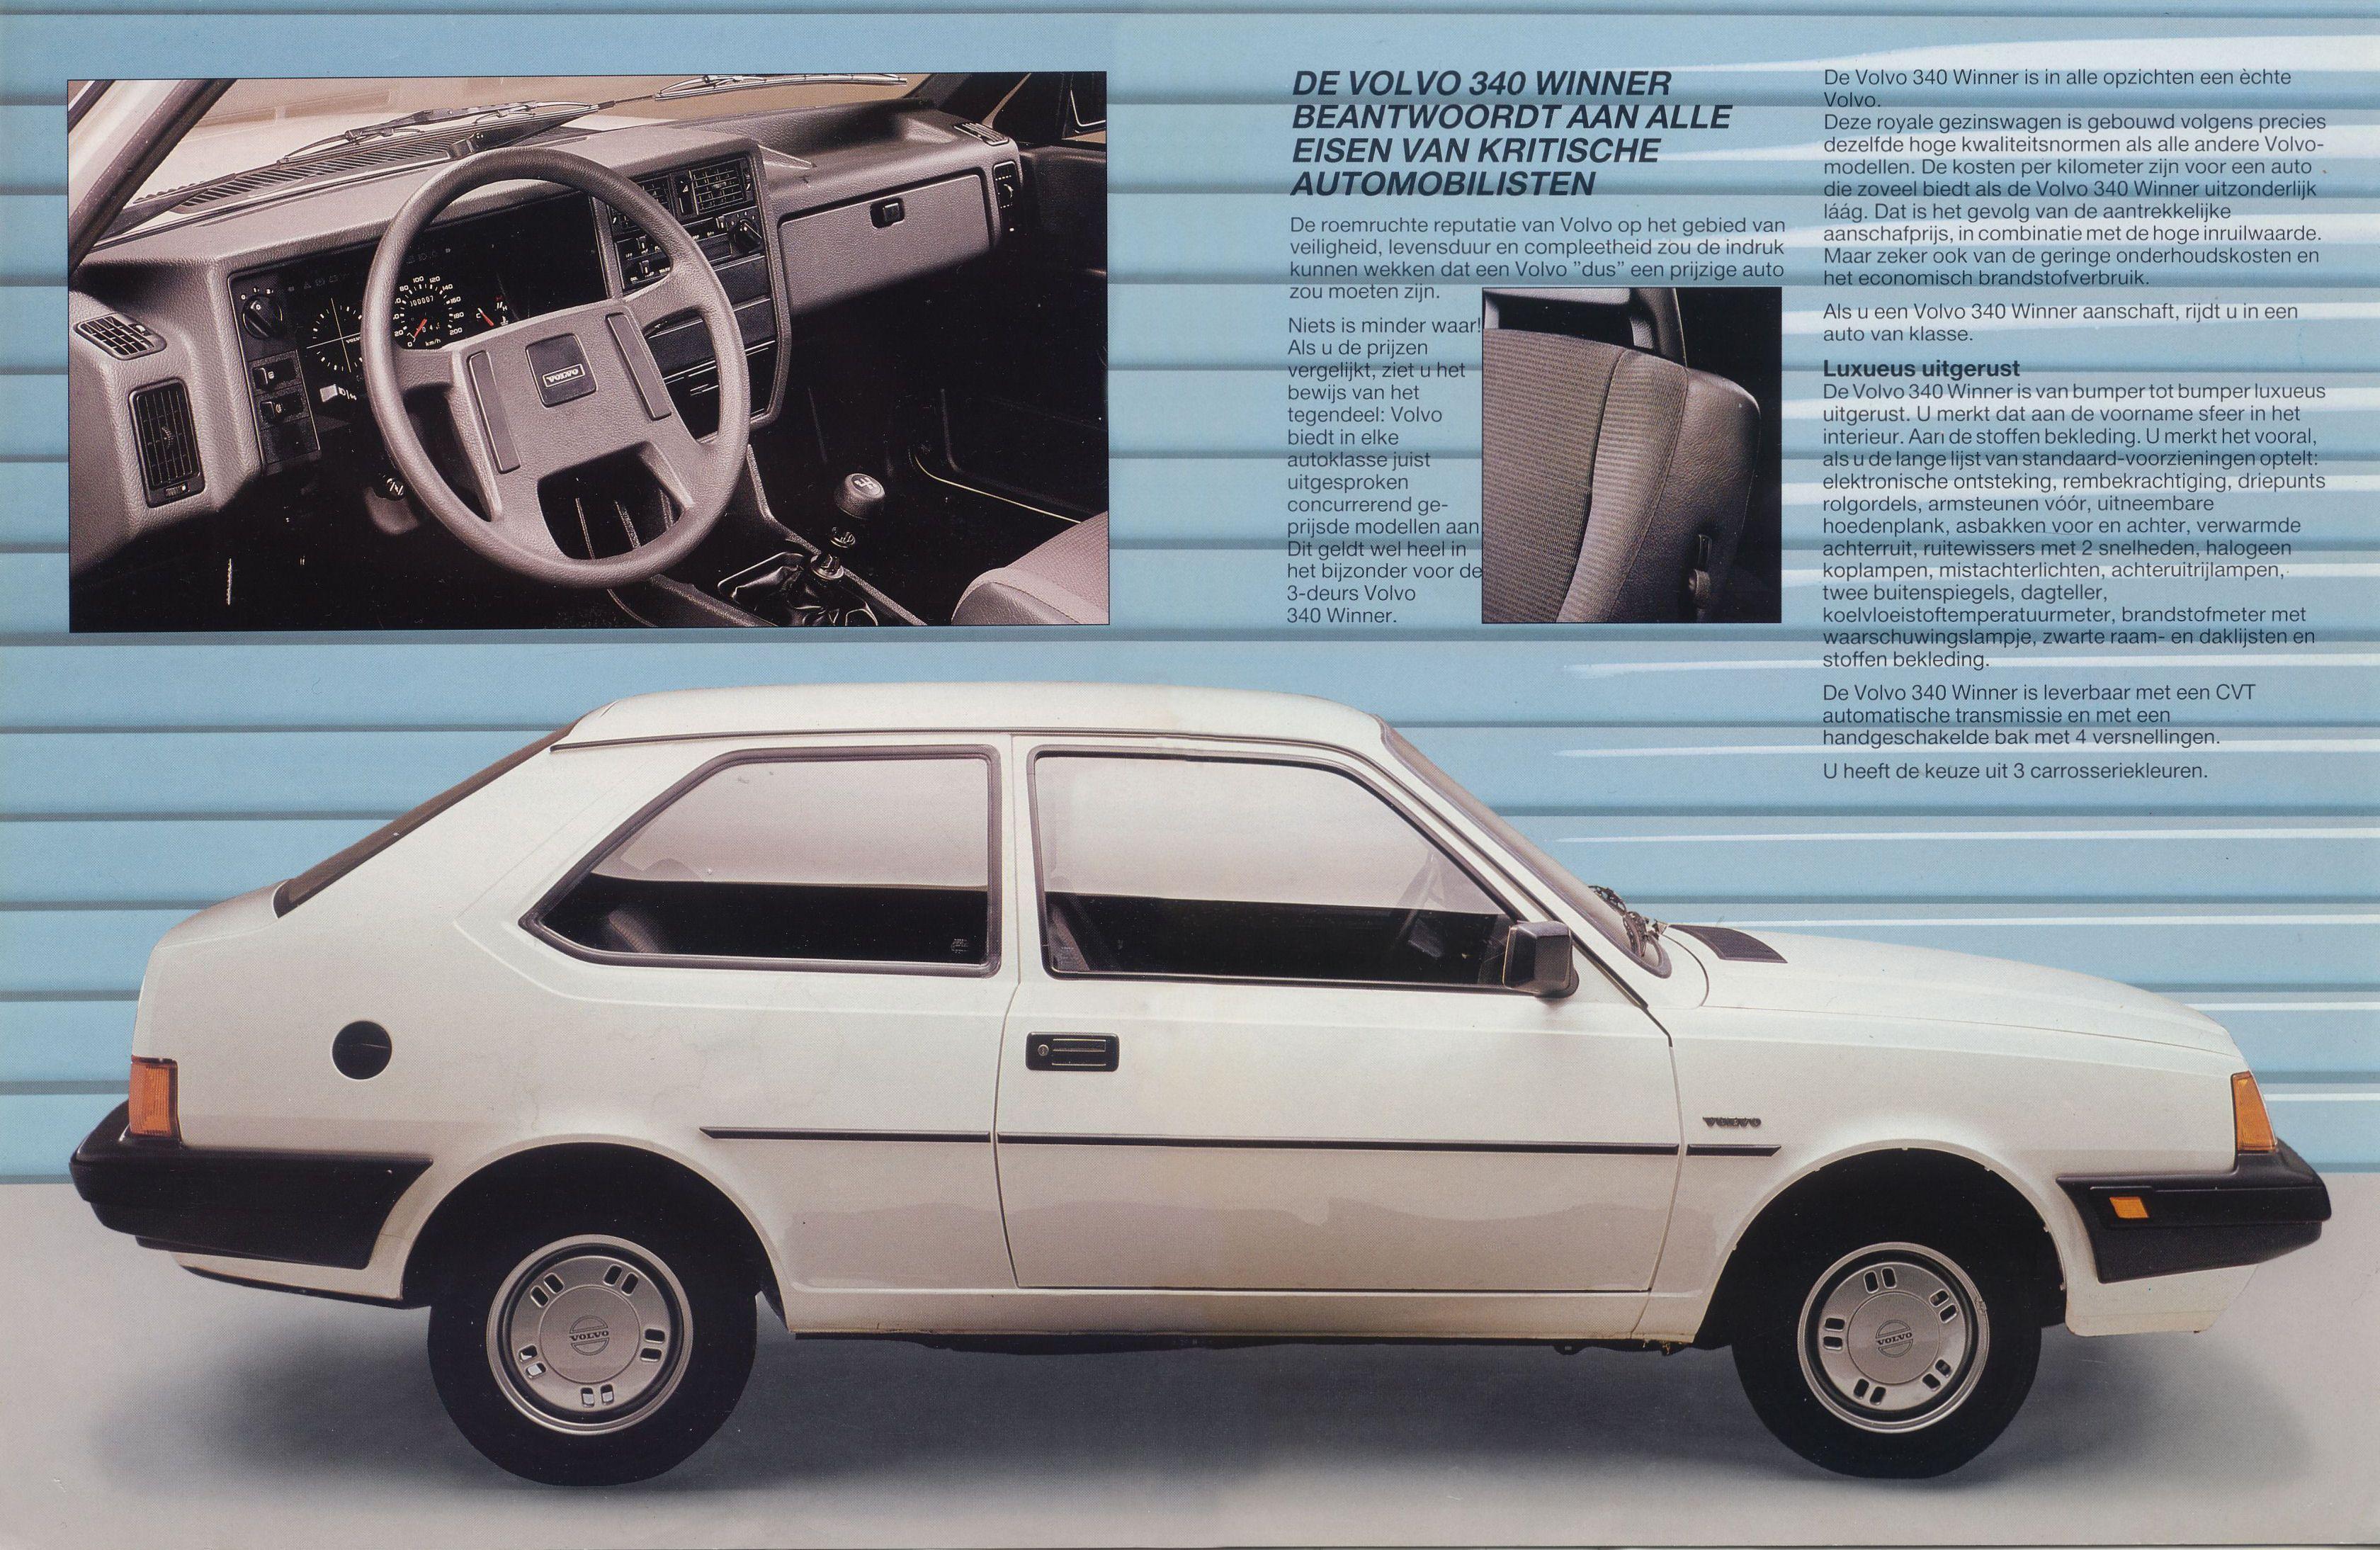 1986 Volvo 340 brochure